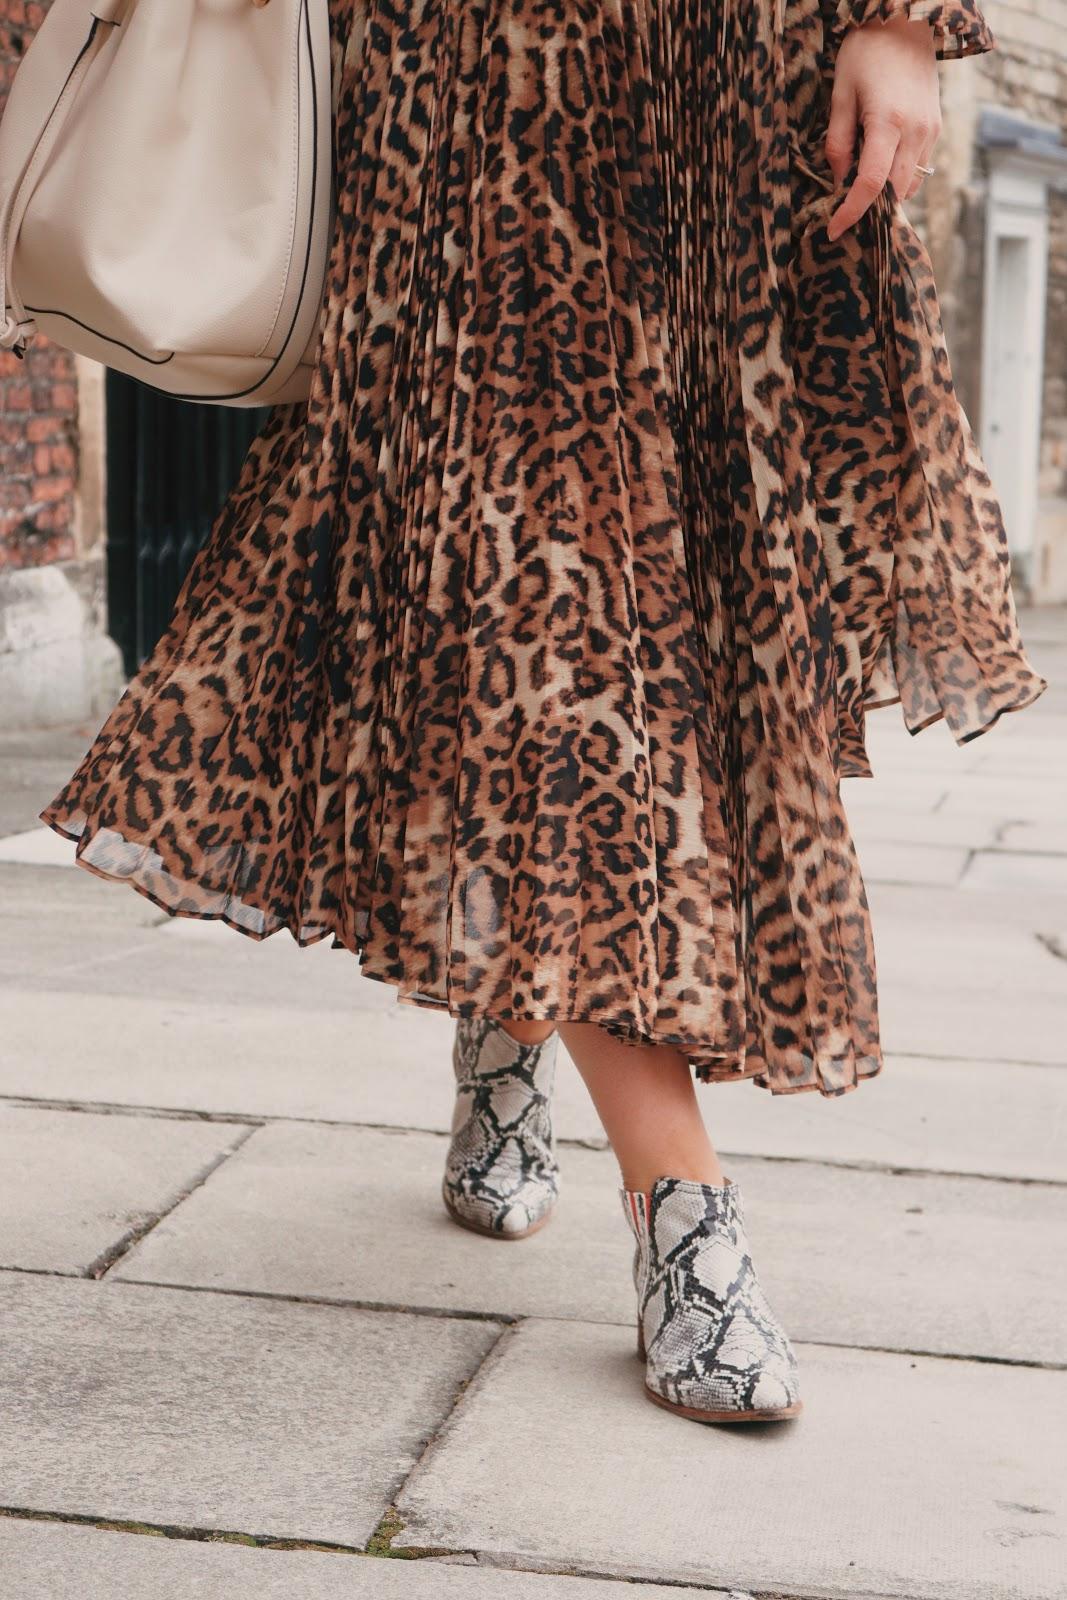 Snake skin boots fashion ideas